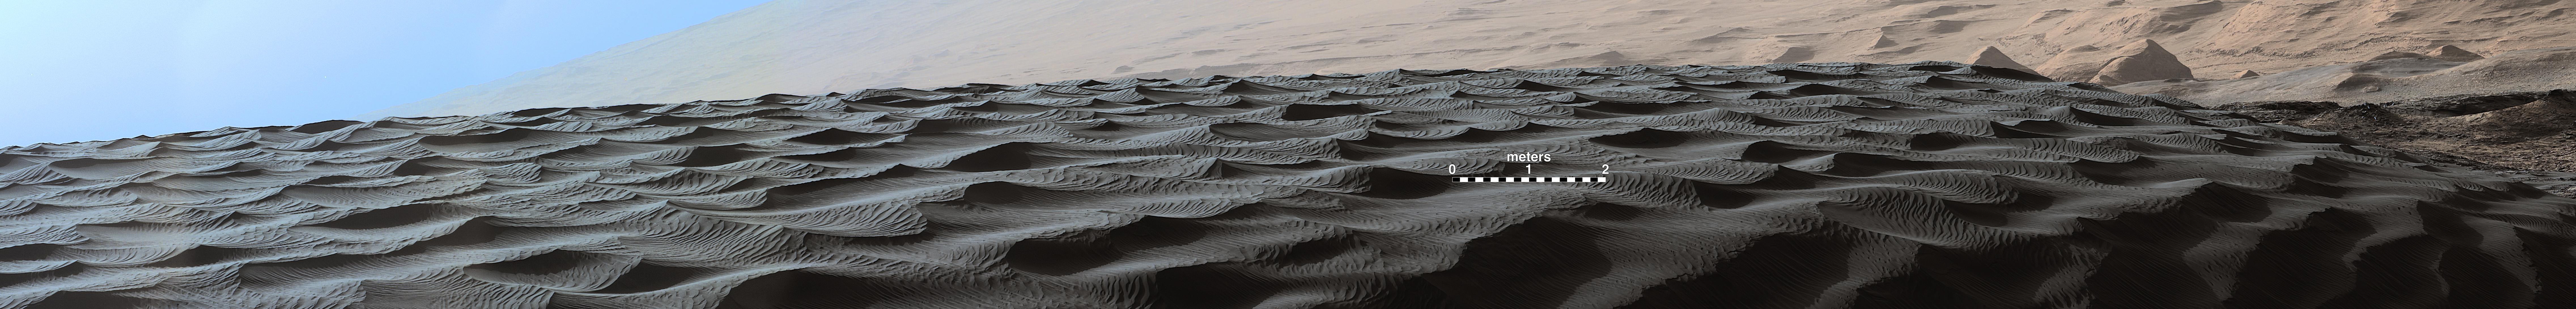 mars-sand-dunes-scale-PIA20755